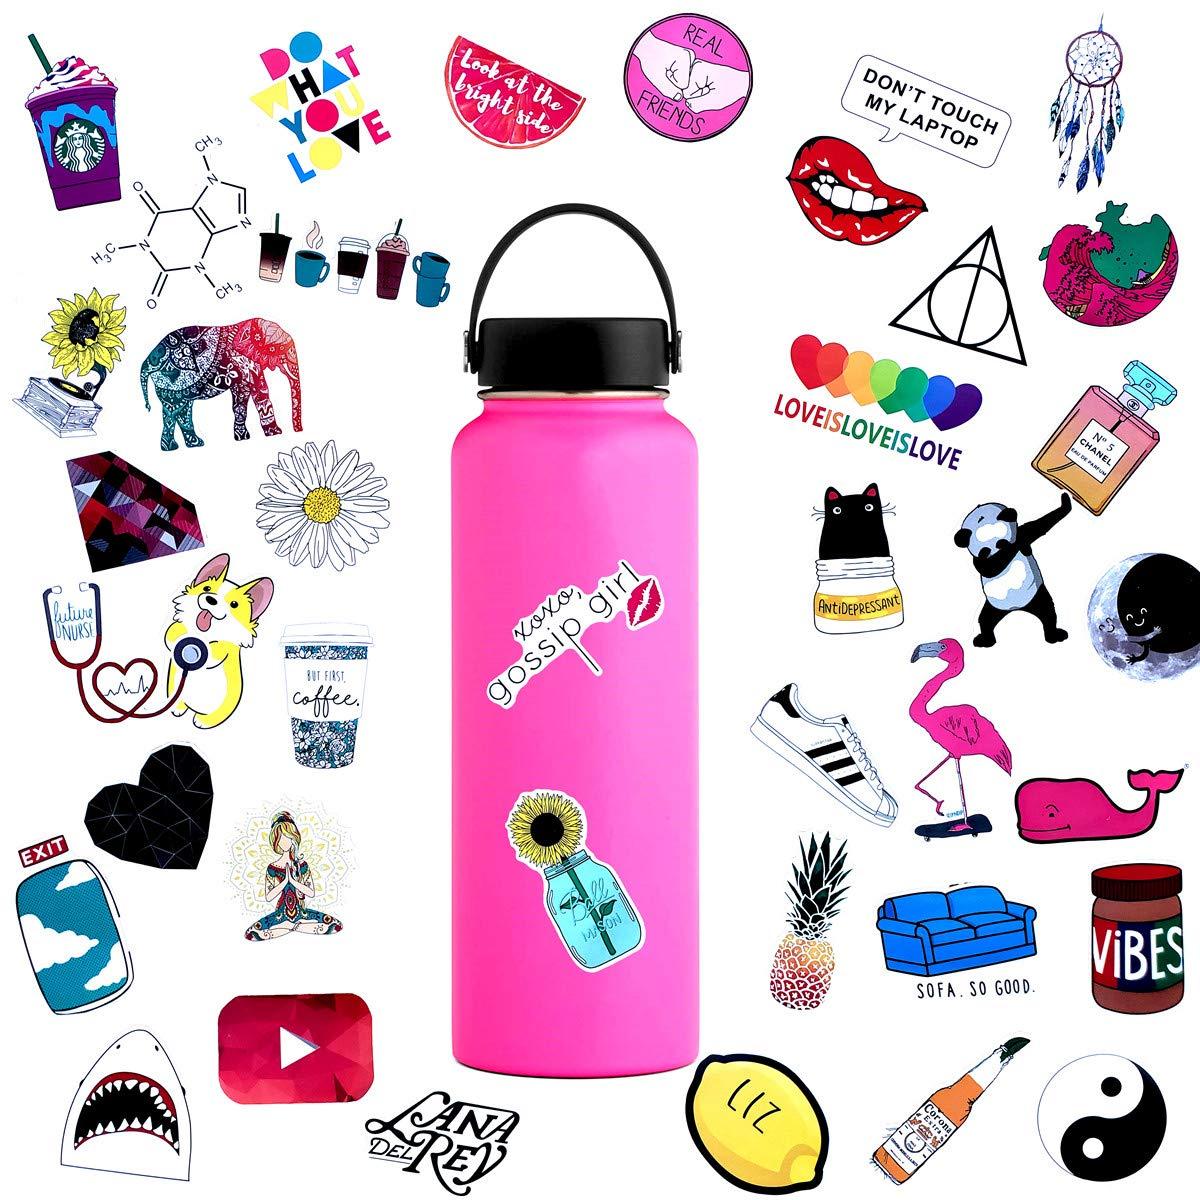 45pcs Water Bottle Sticker Decals Waterproof,Cute Bumper and Laptop  Stickers for Girls,Computer,Car,Skateboard, Luggage,Snowboard[Not Random].